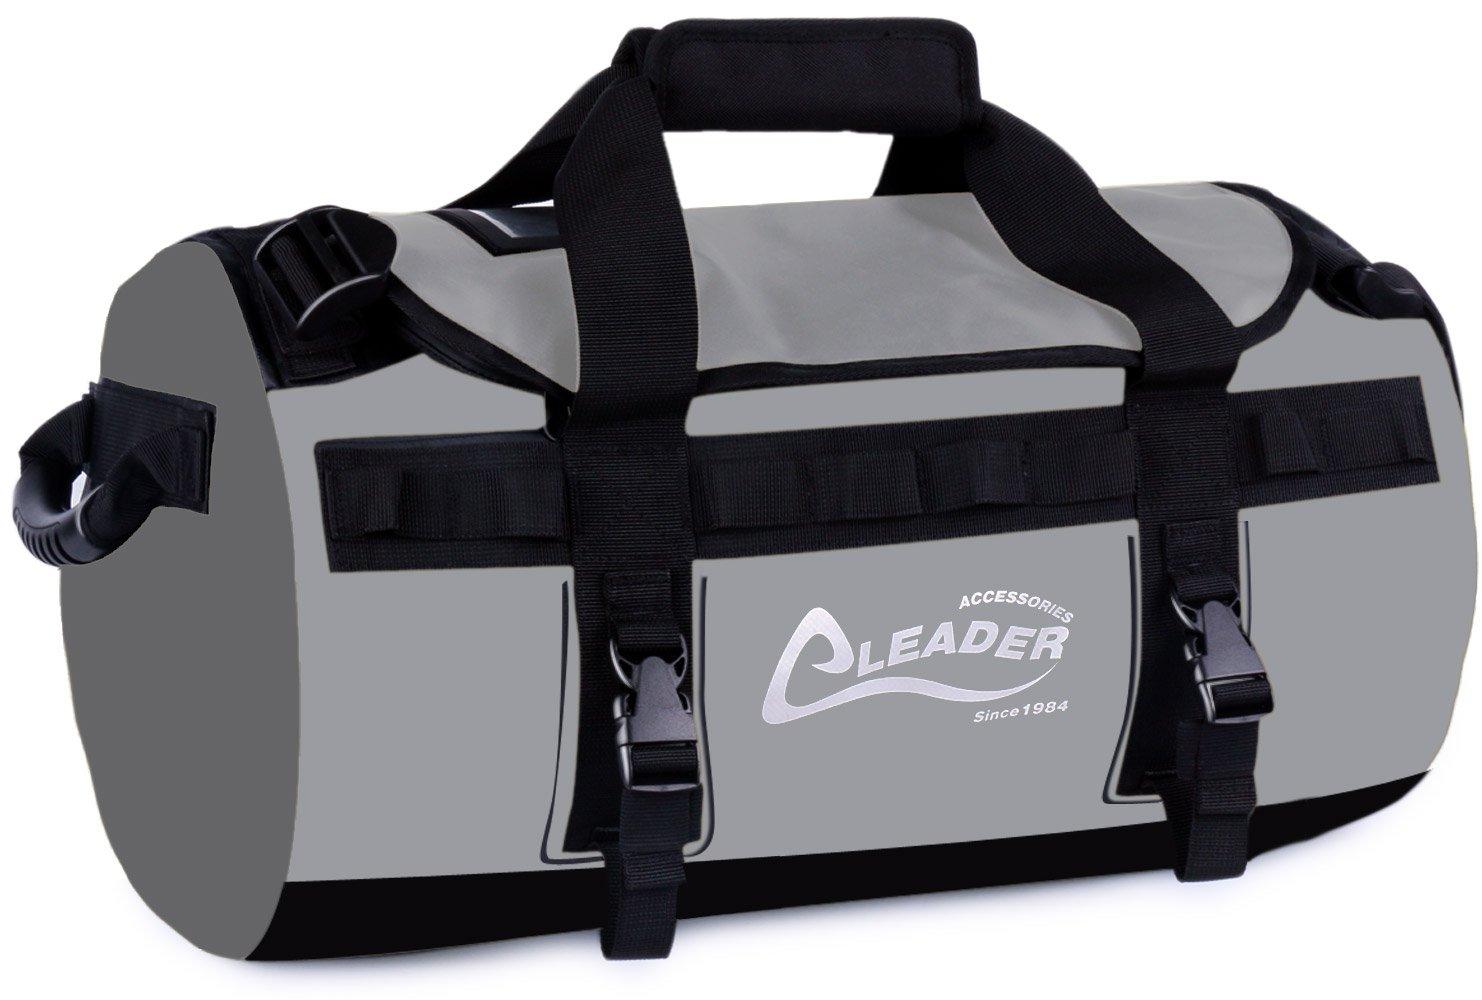 Leader Accessories Deluxe Water Resistant PVC Tarpaulin Duffel Bag Backpack (Grey, 40L) by Leader Accessories